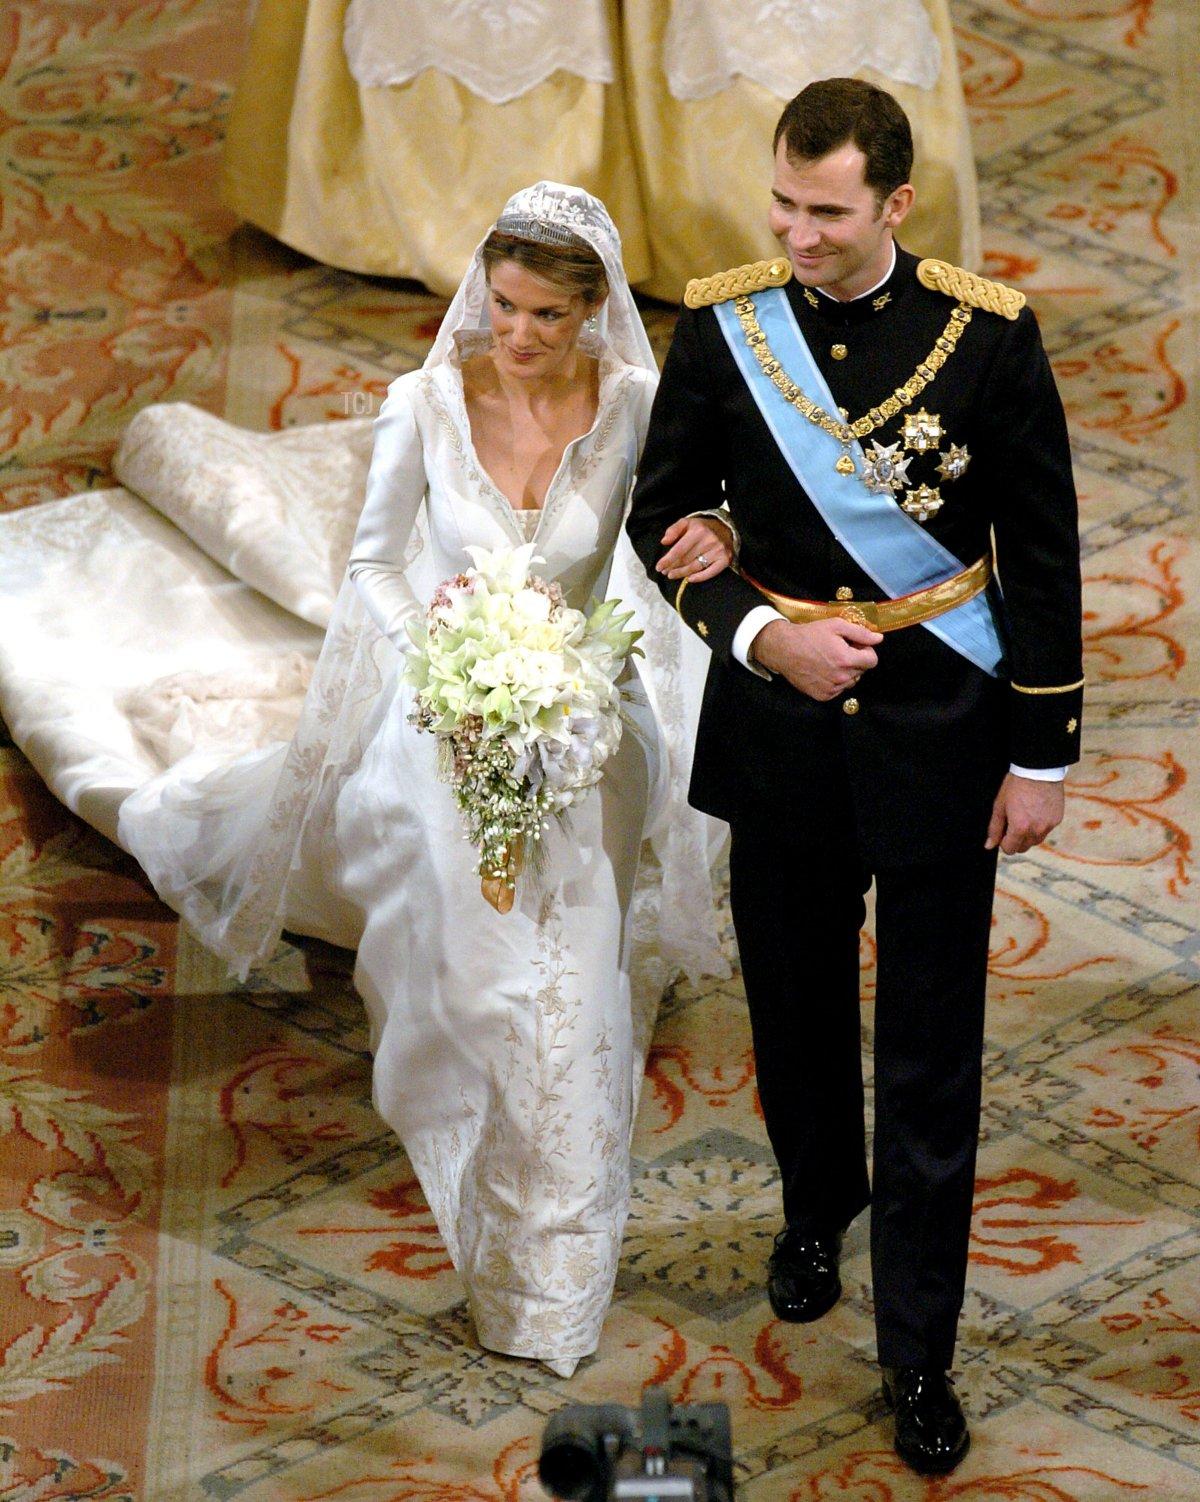 Spain's Crown Prince Felipe de Bourbon walks next to his bride Letizia Ortiz during their wedding ceremony in Almudena cathedral May 22, 2004 in Madrid